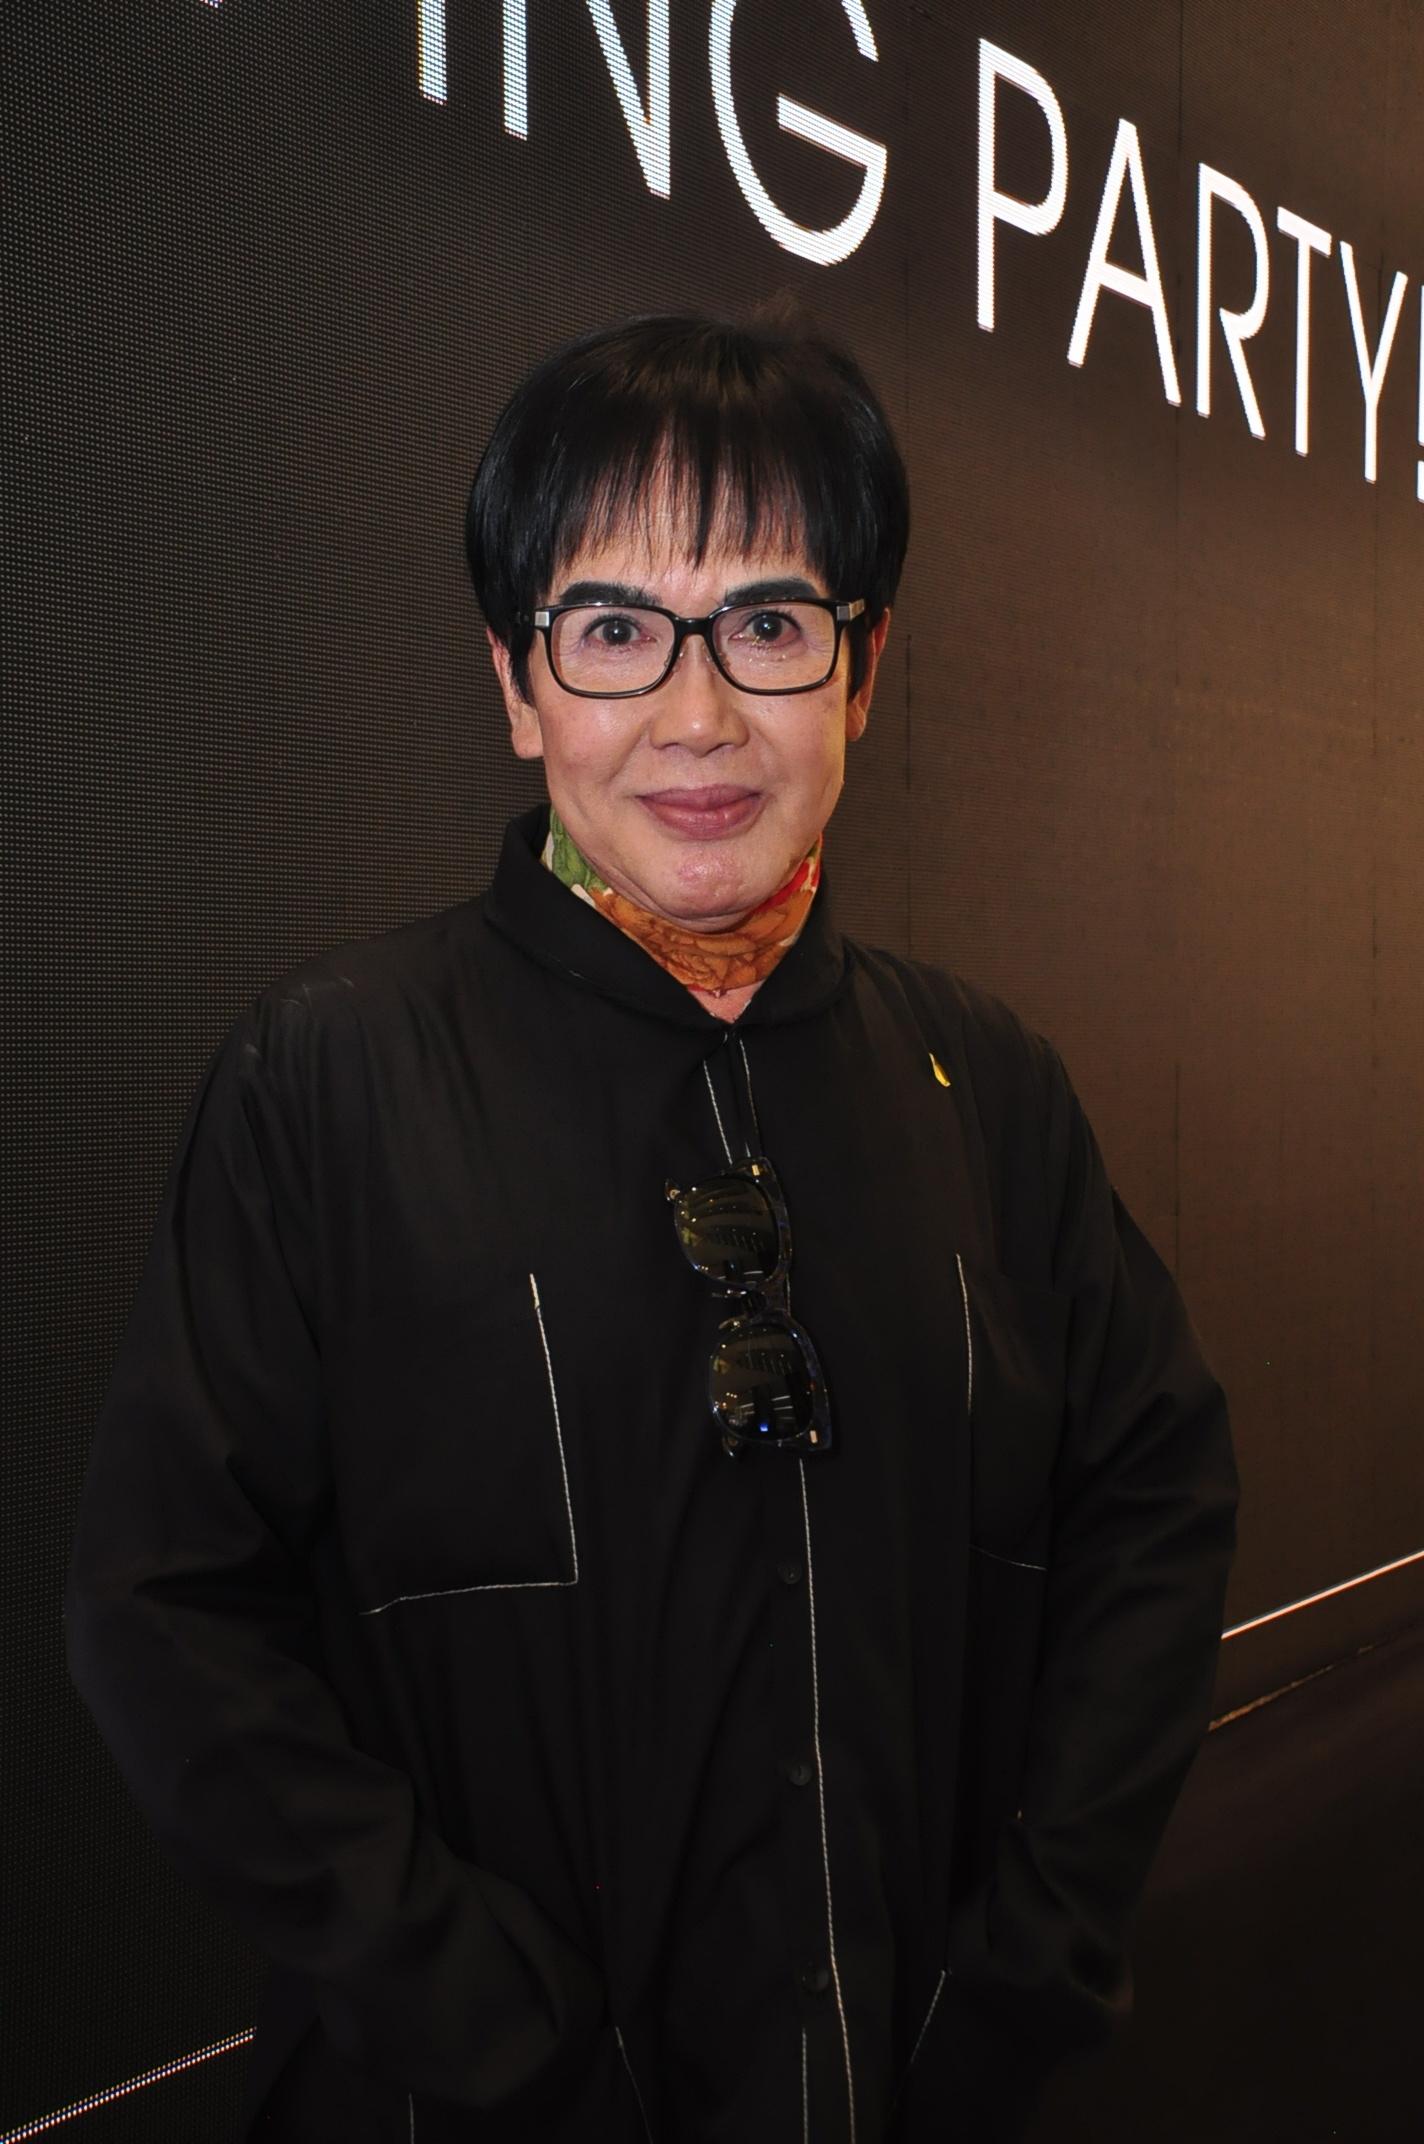 Makeup artist Fanny Serrano